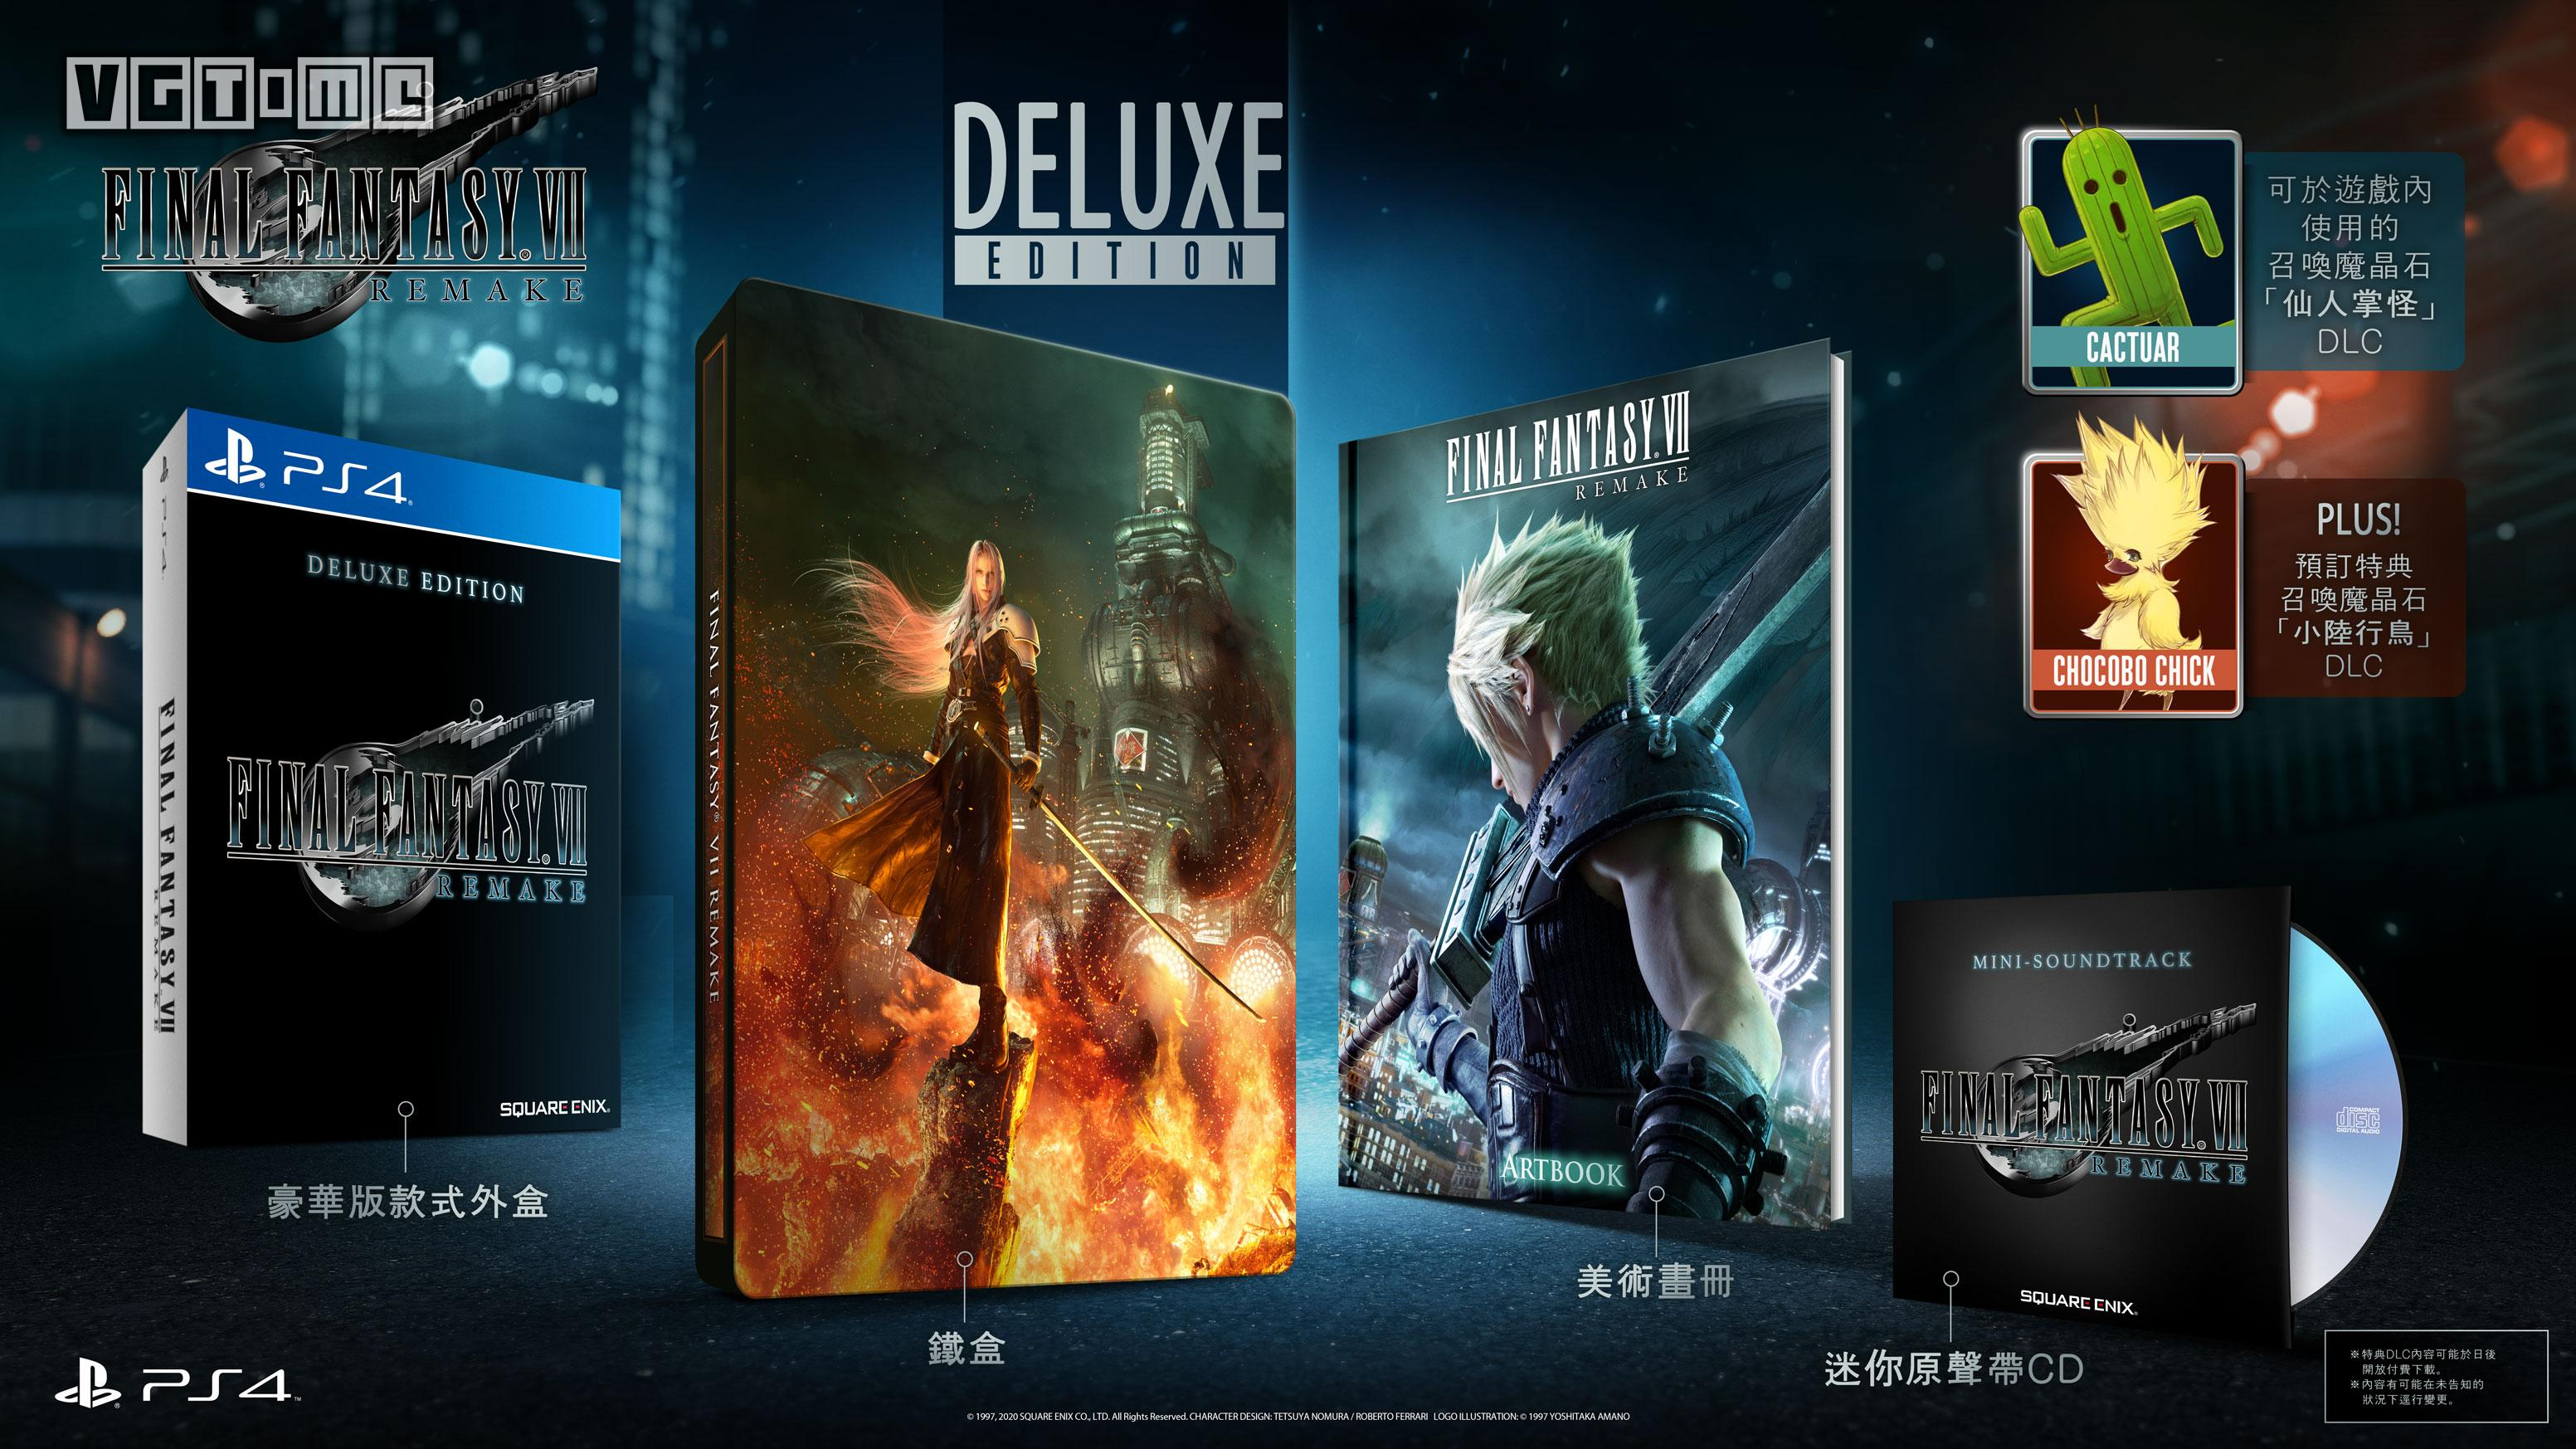 PS4《最终幻想7 重制版》港版将于1月22日开始预购 实体版特典为神罗员工ID卡